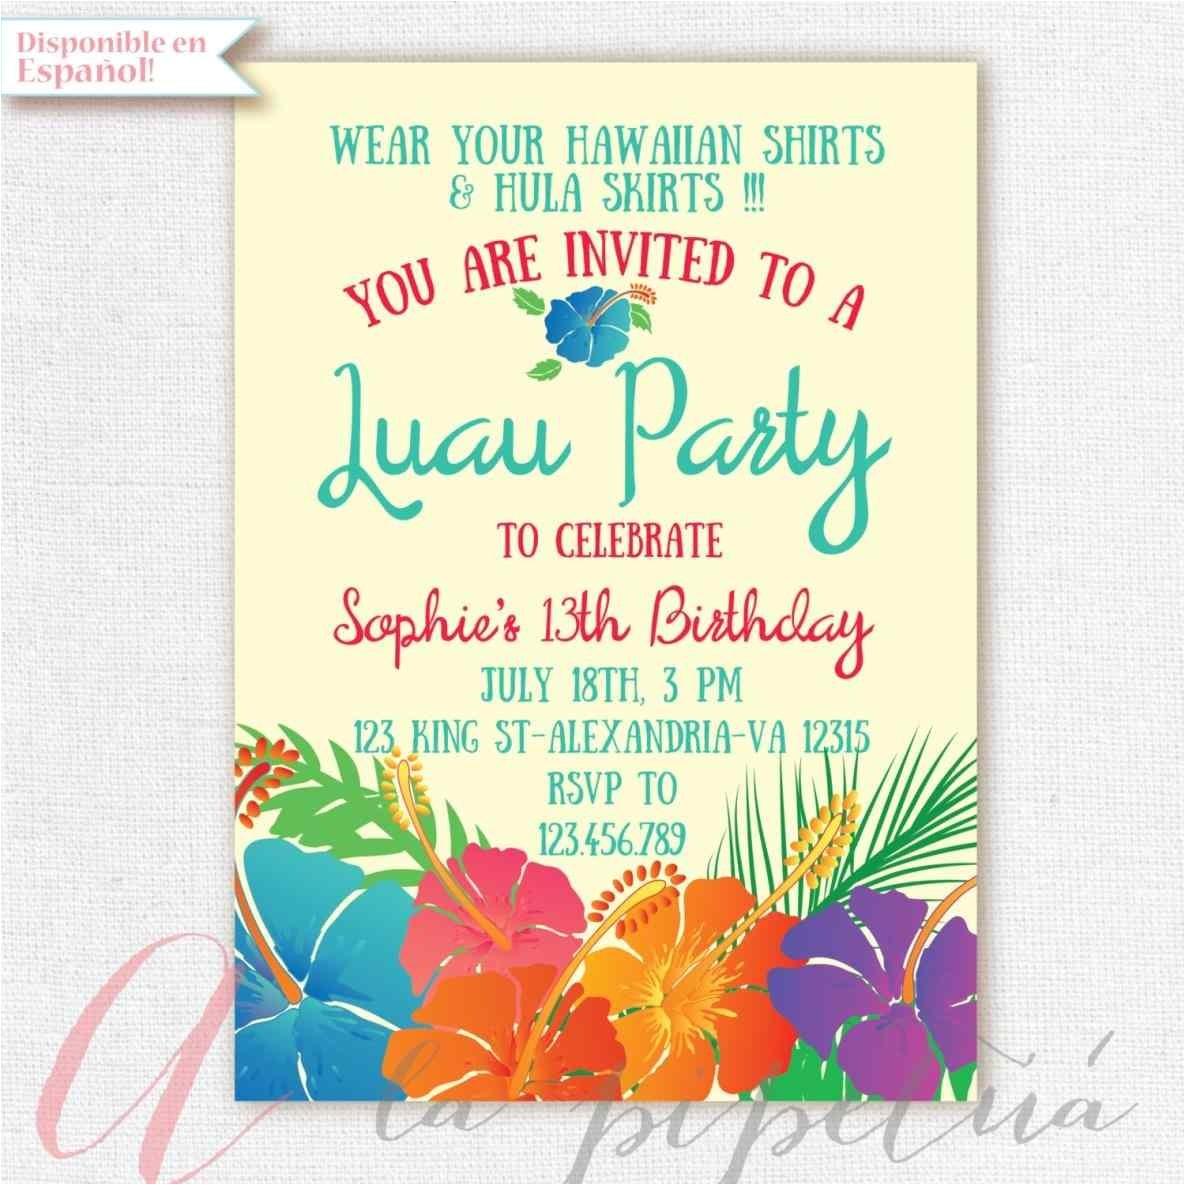 invitations templates birthday businnes card invitation pool birthday blank luau party invitations invitation